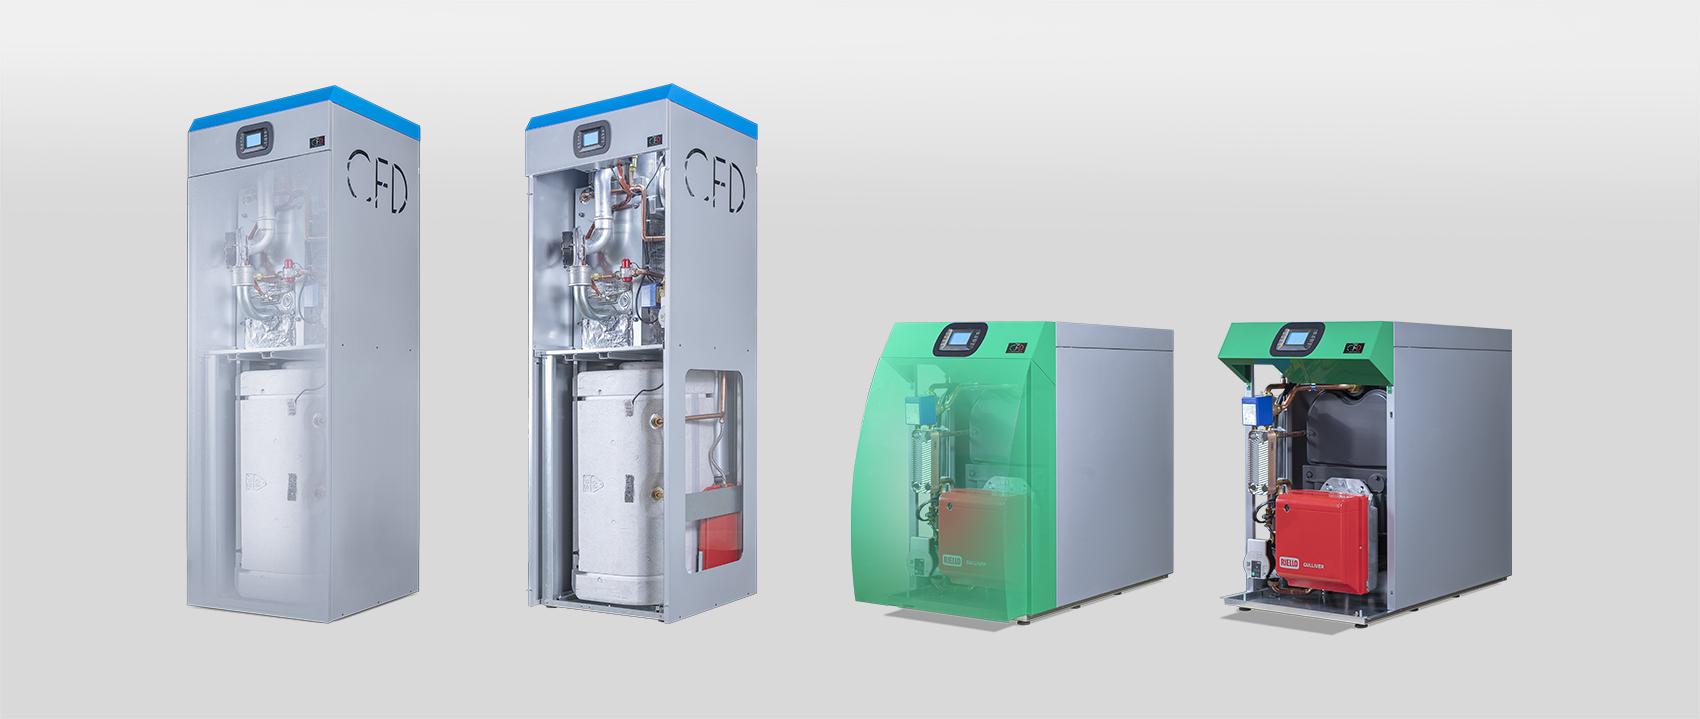 Rendering 3D - CFD Cooperativa Fonderia Dante | OIS